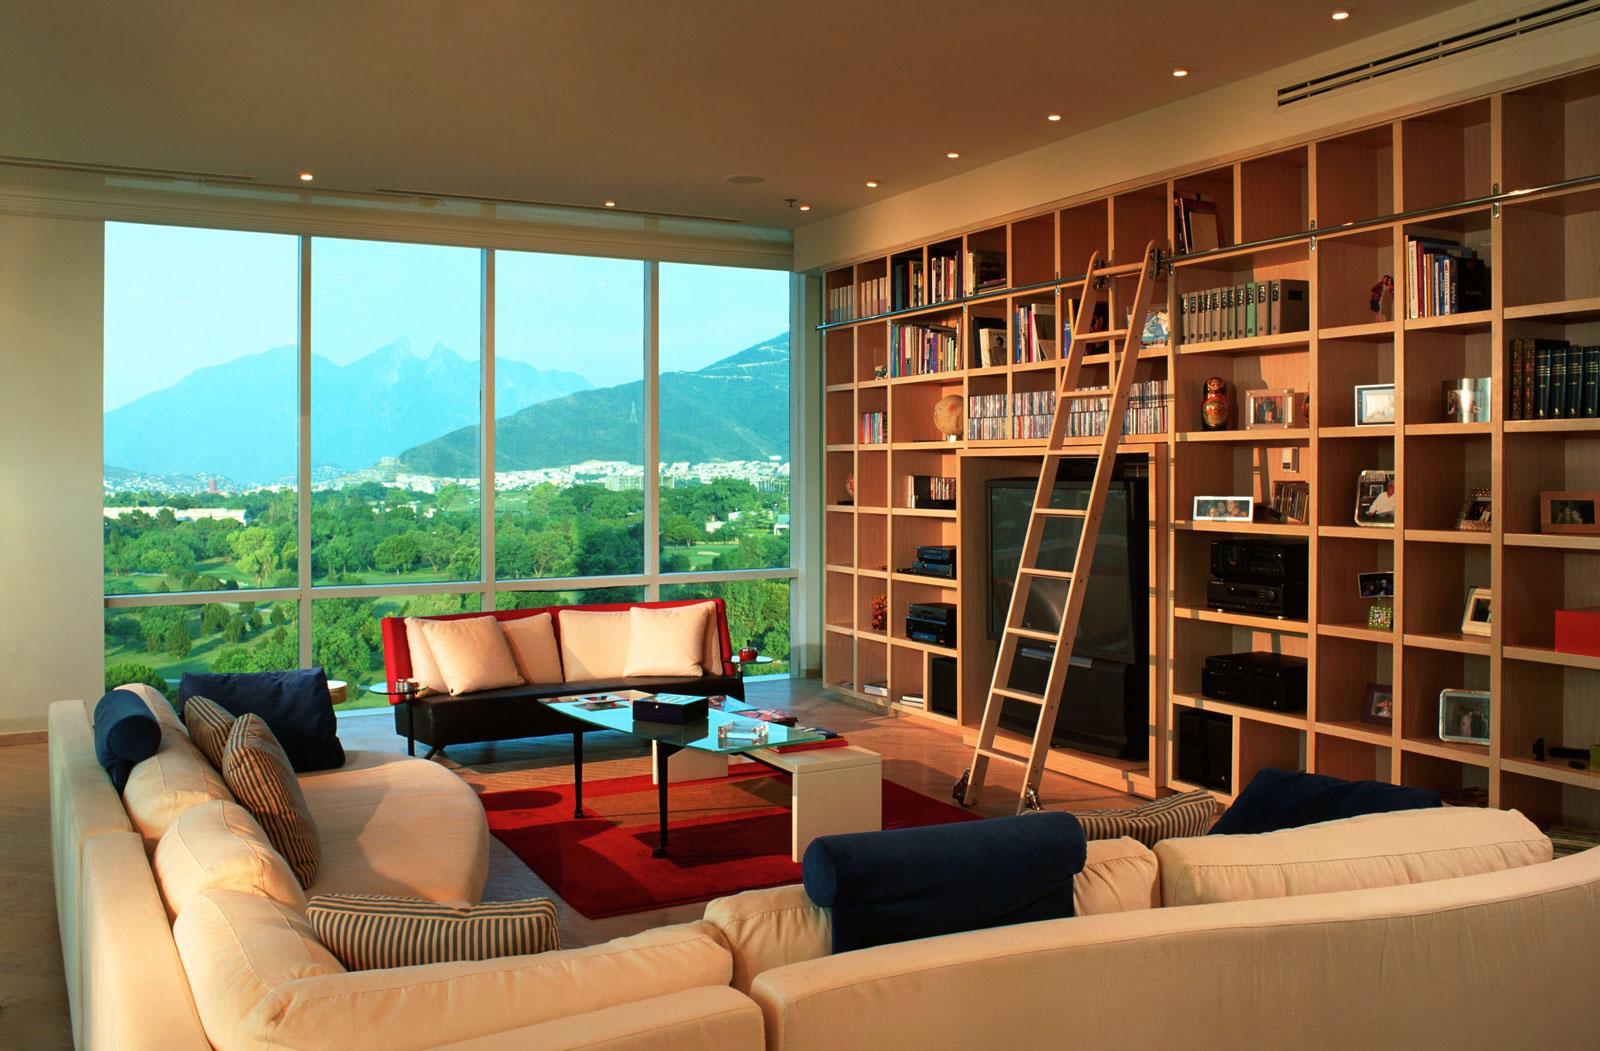 Contemporary Country Club loft Apartment